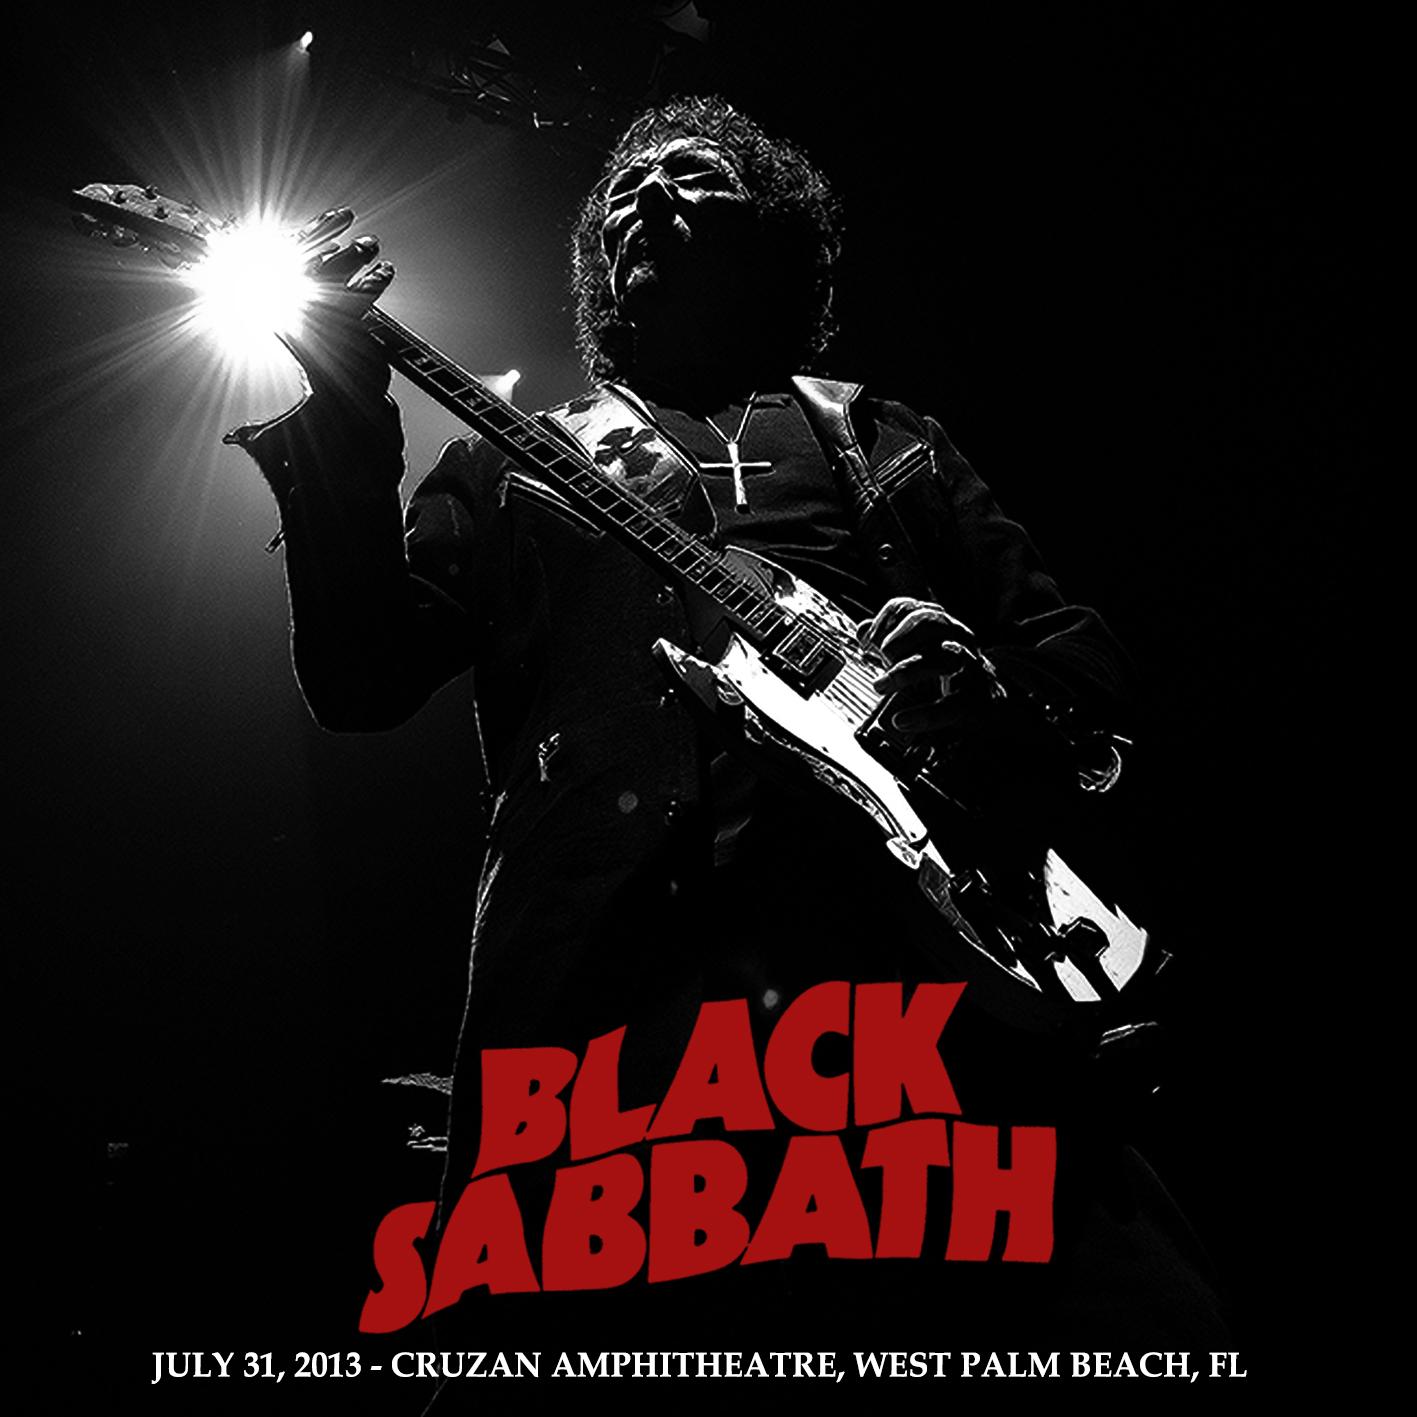 heavy rock bootlegs black sabbath 2013 07 31 cruzan amphitheatre west palm beach. Black Bedroom Furniture Sets. Home Design Ideas